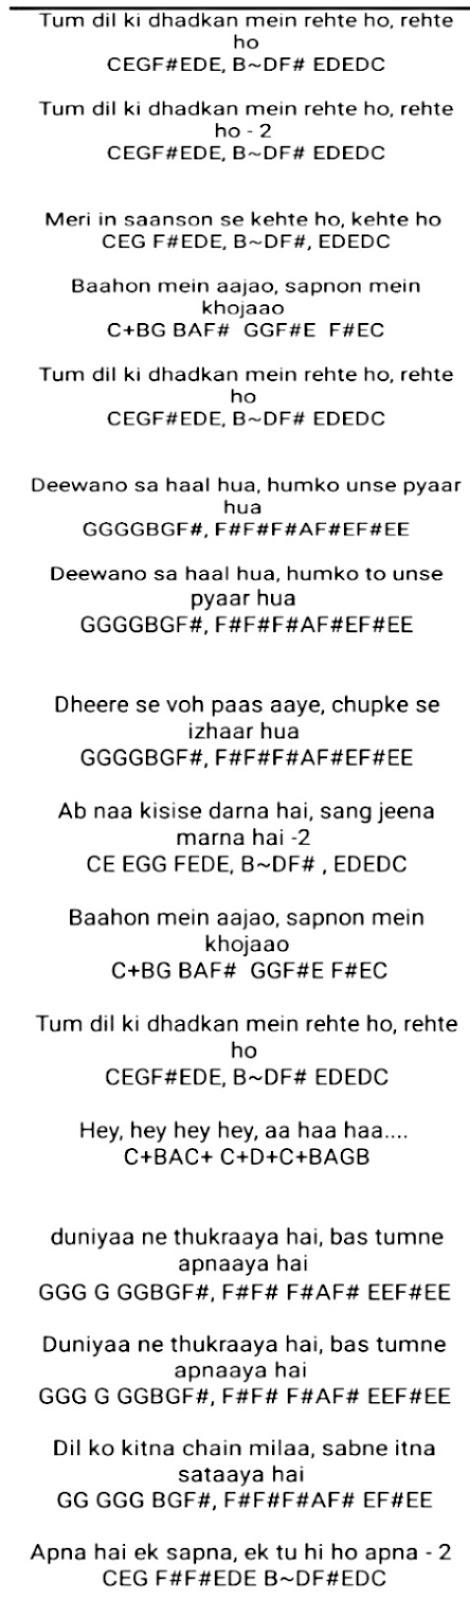 Tum Dil Ki Dhadkan Mein Song Piano Notes